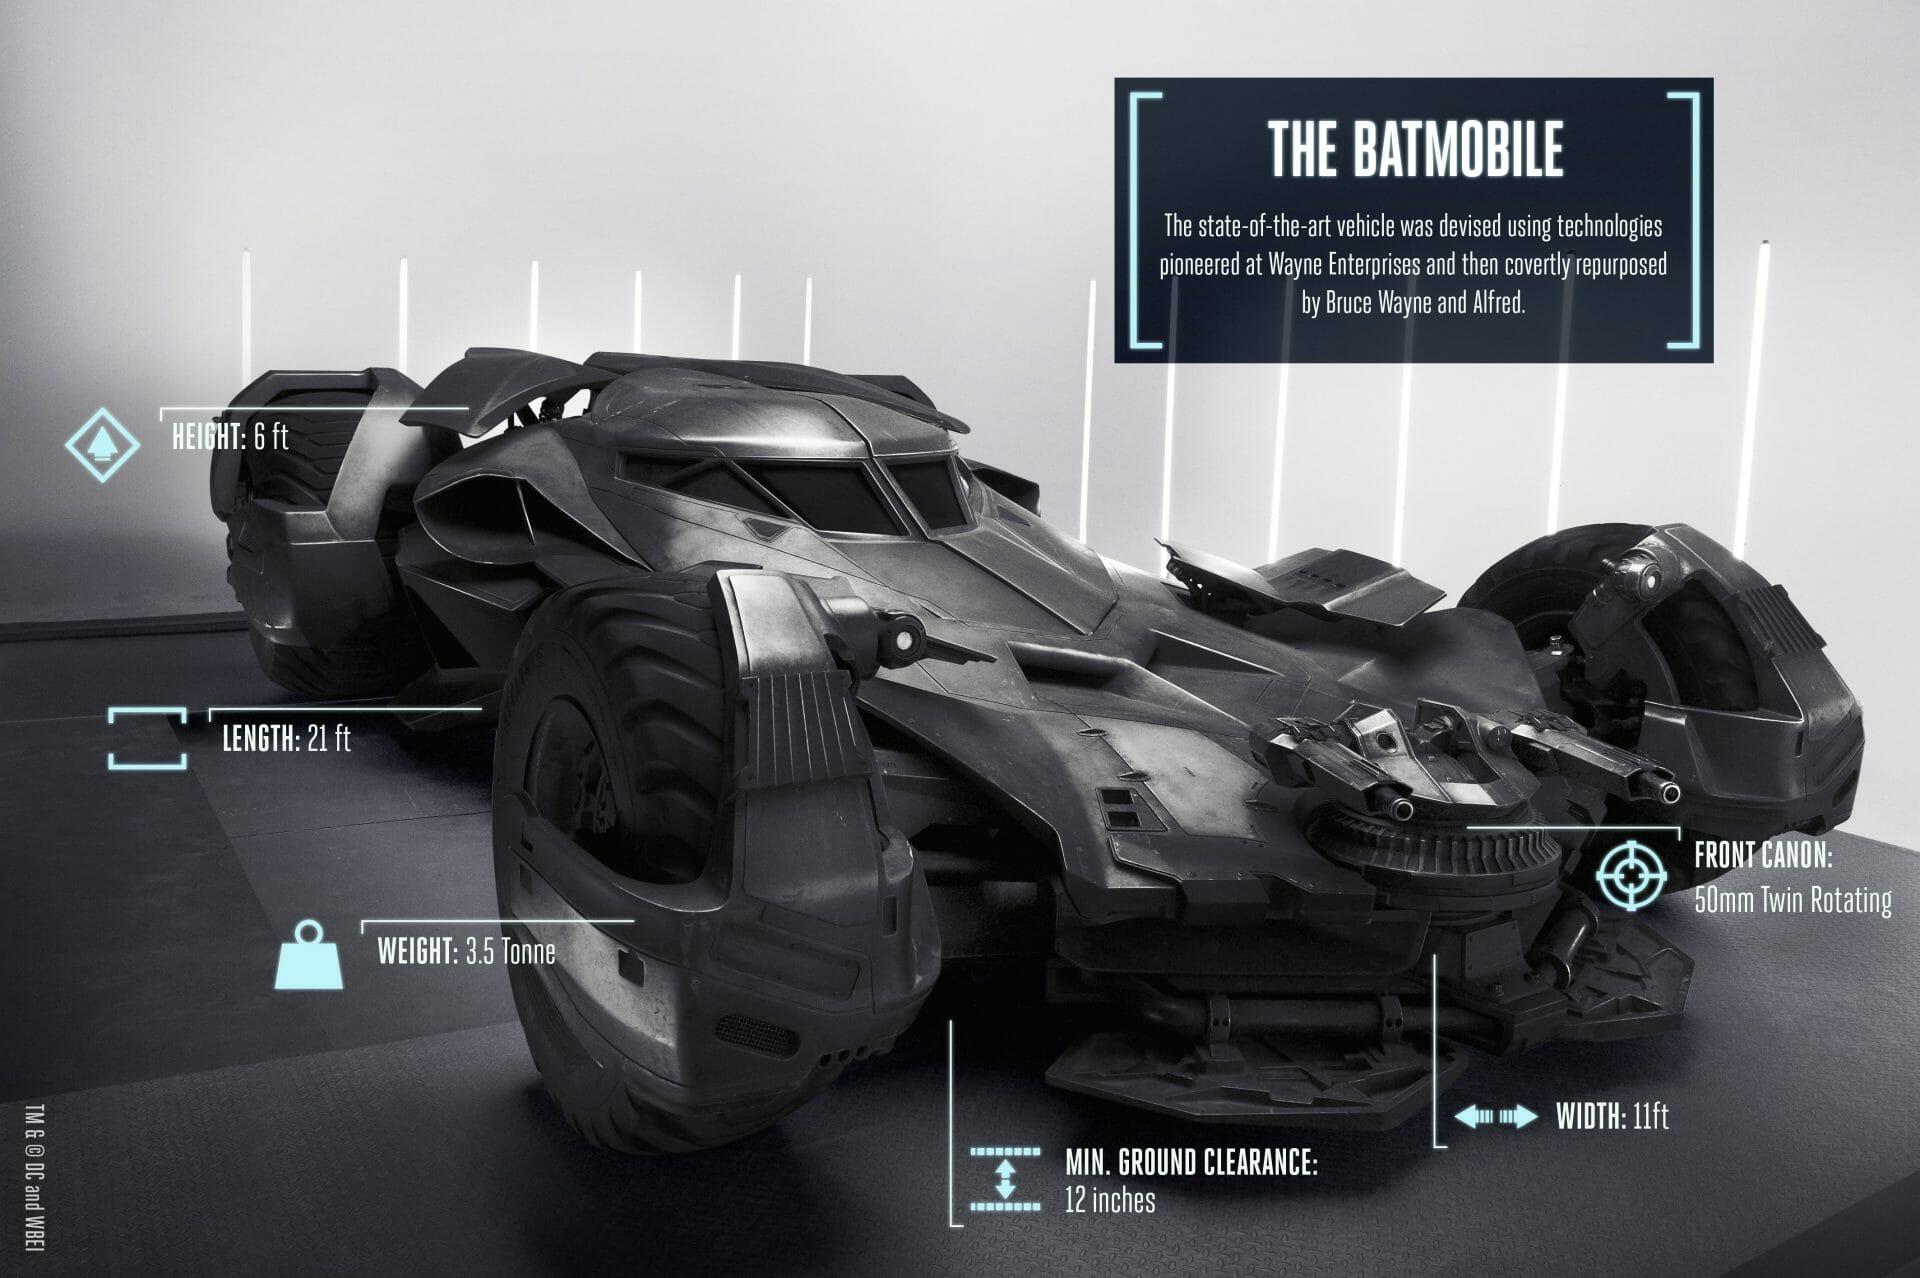 The Batmobile infographic